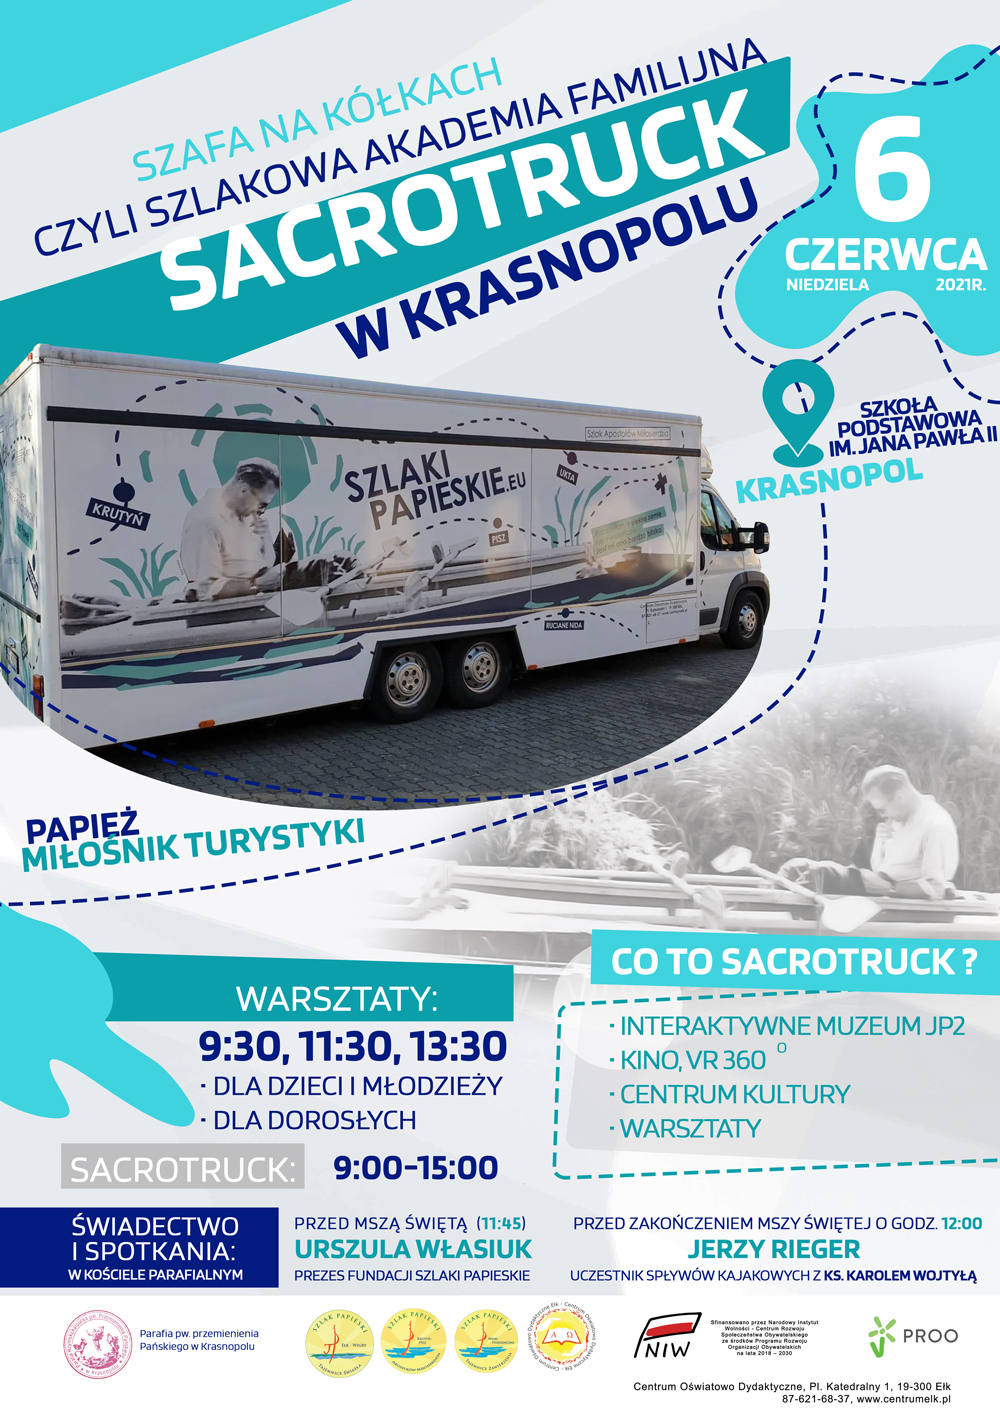 Sacrotruck w Krasnopolu